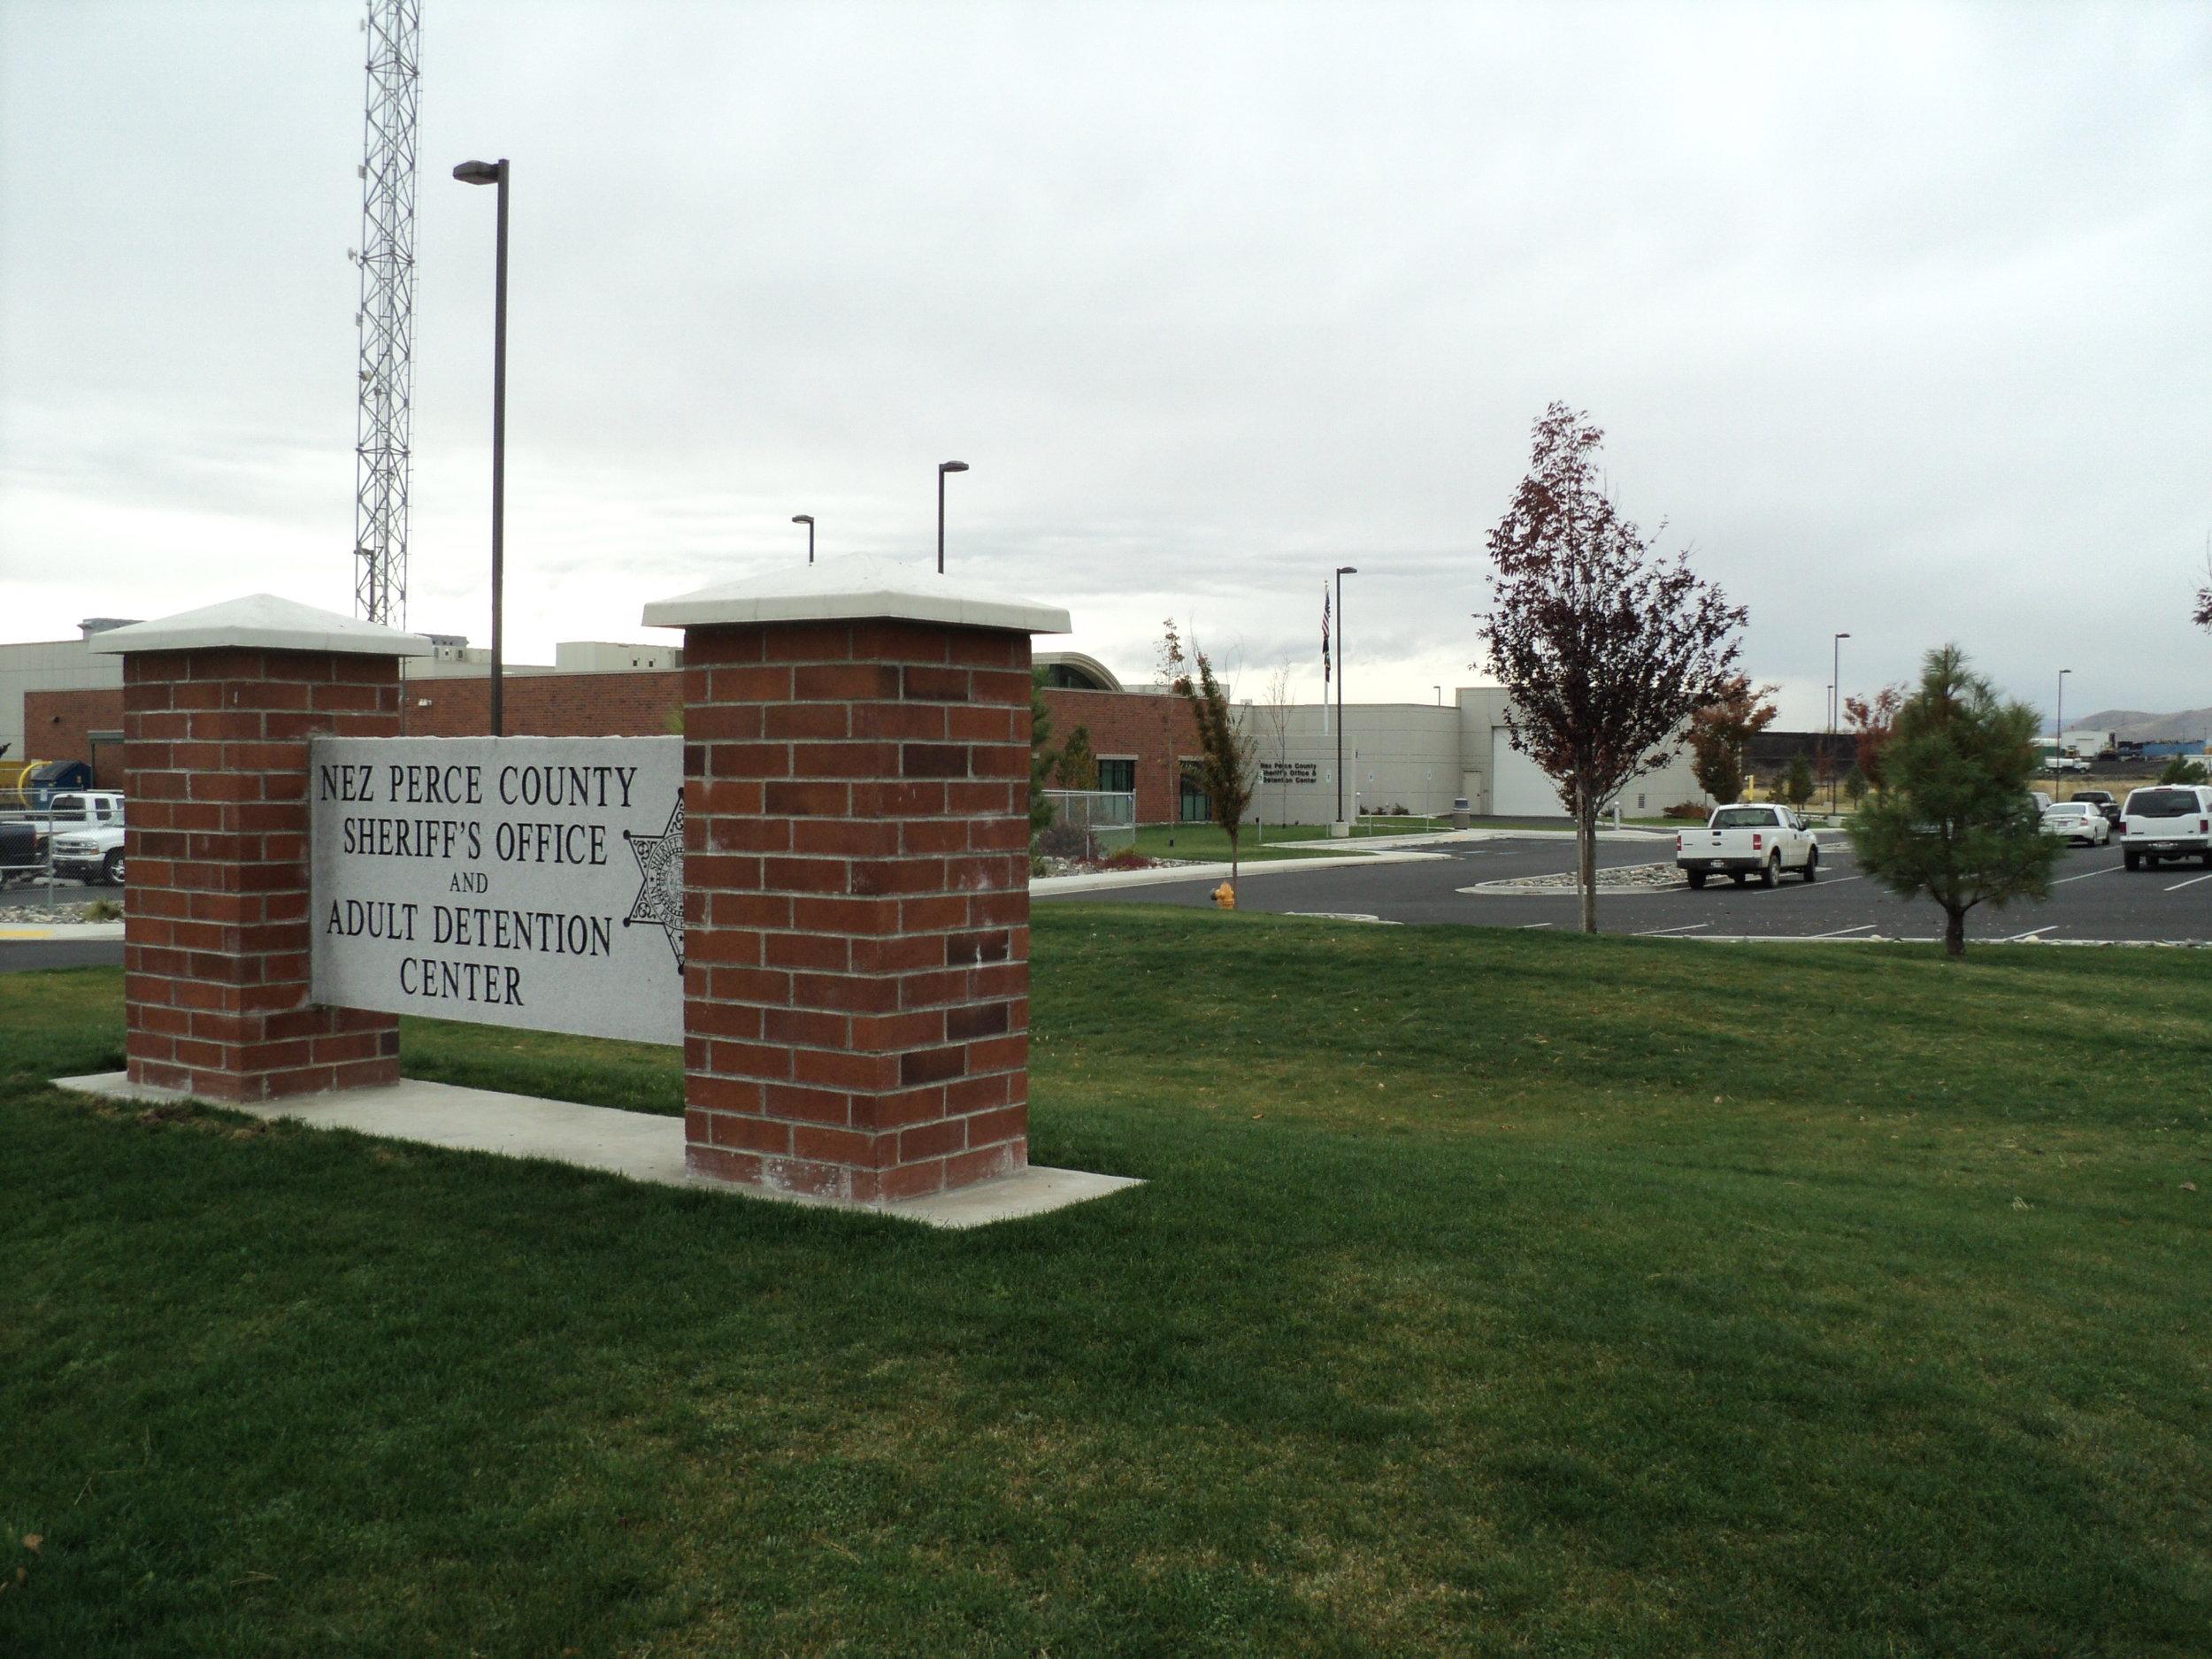 Nez Perce County Jail in Port of Lewiston, Idaho